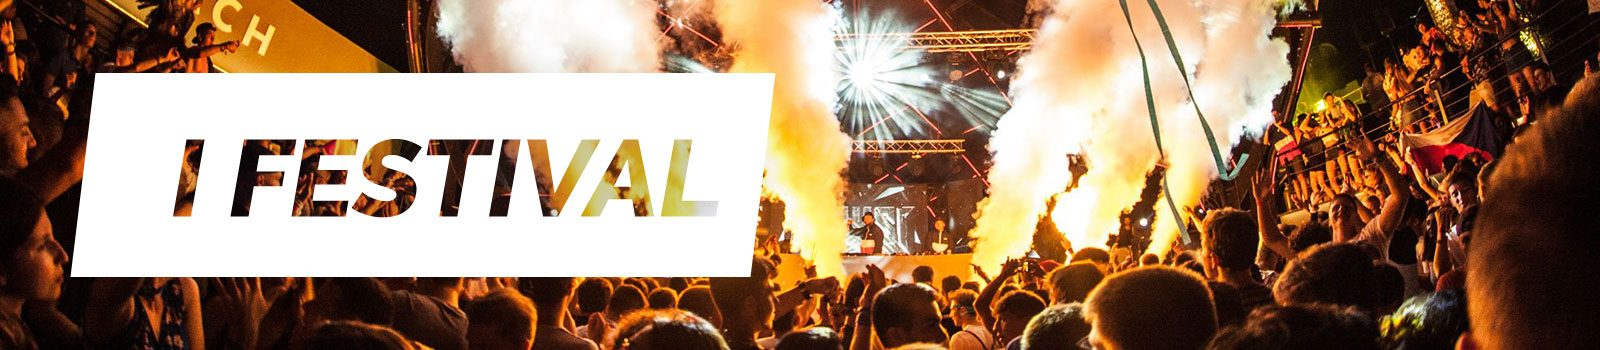 b8-pag-fun-i-festival